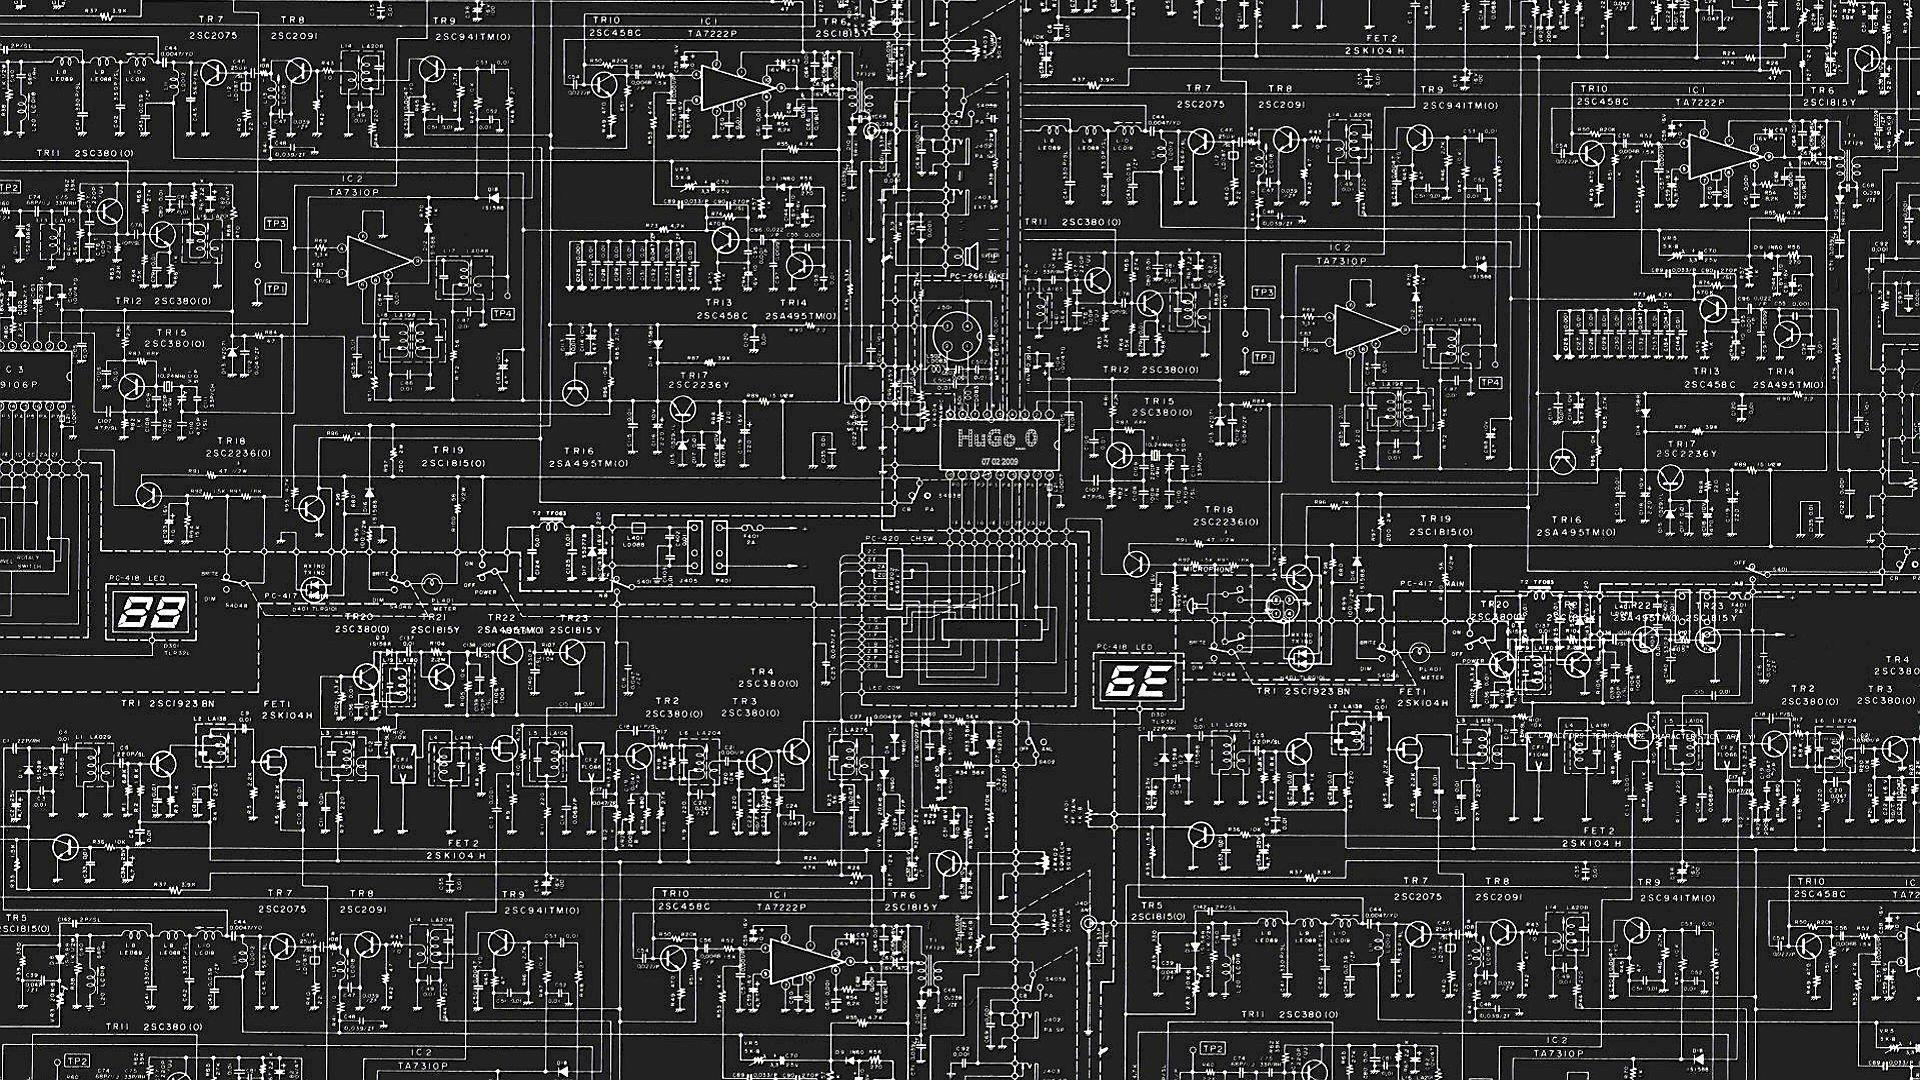 Computer Engineer Wallpapers Top Free Computer Engineer Backgrounds Wallpaperaccess